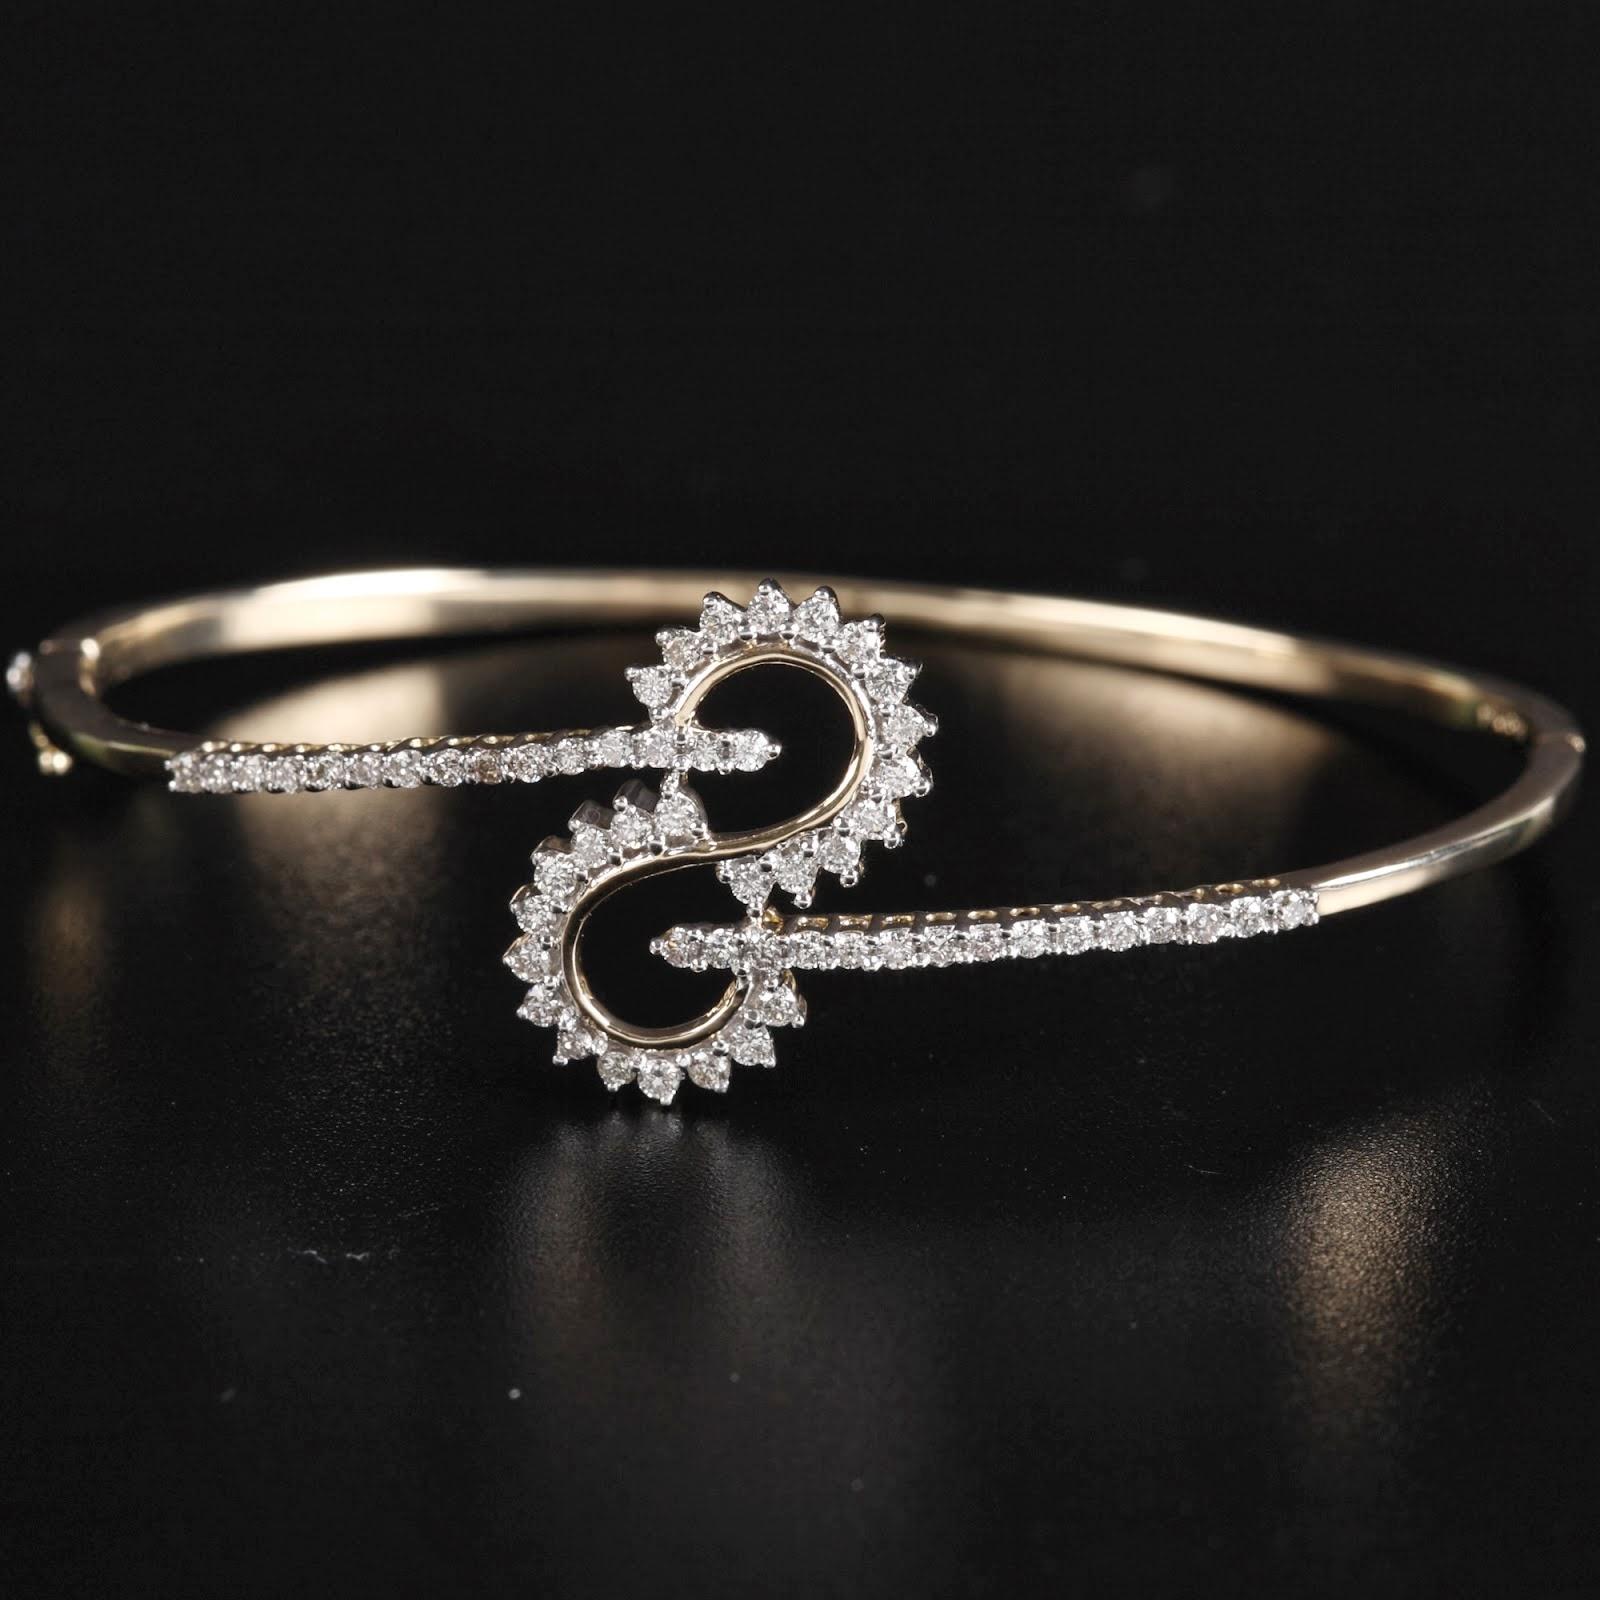 PC Jeweller - Diamond, Gold, Wedding Jewellery